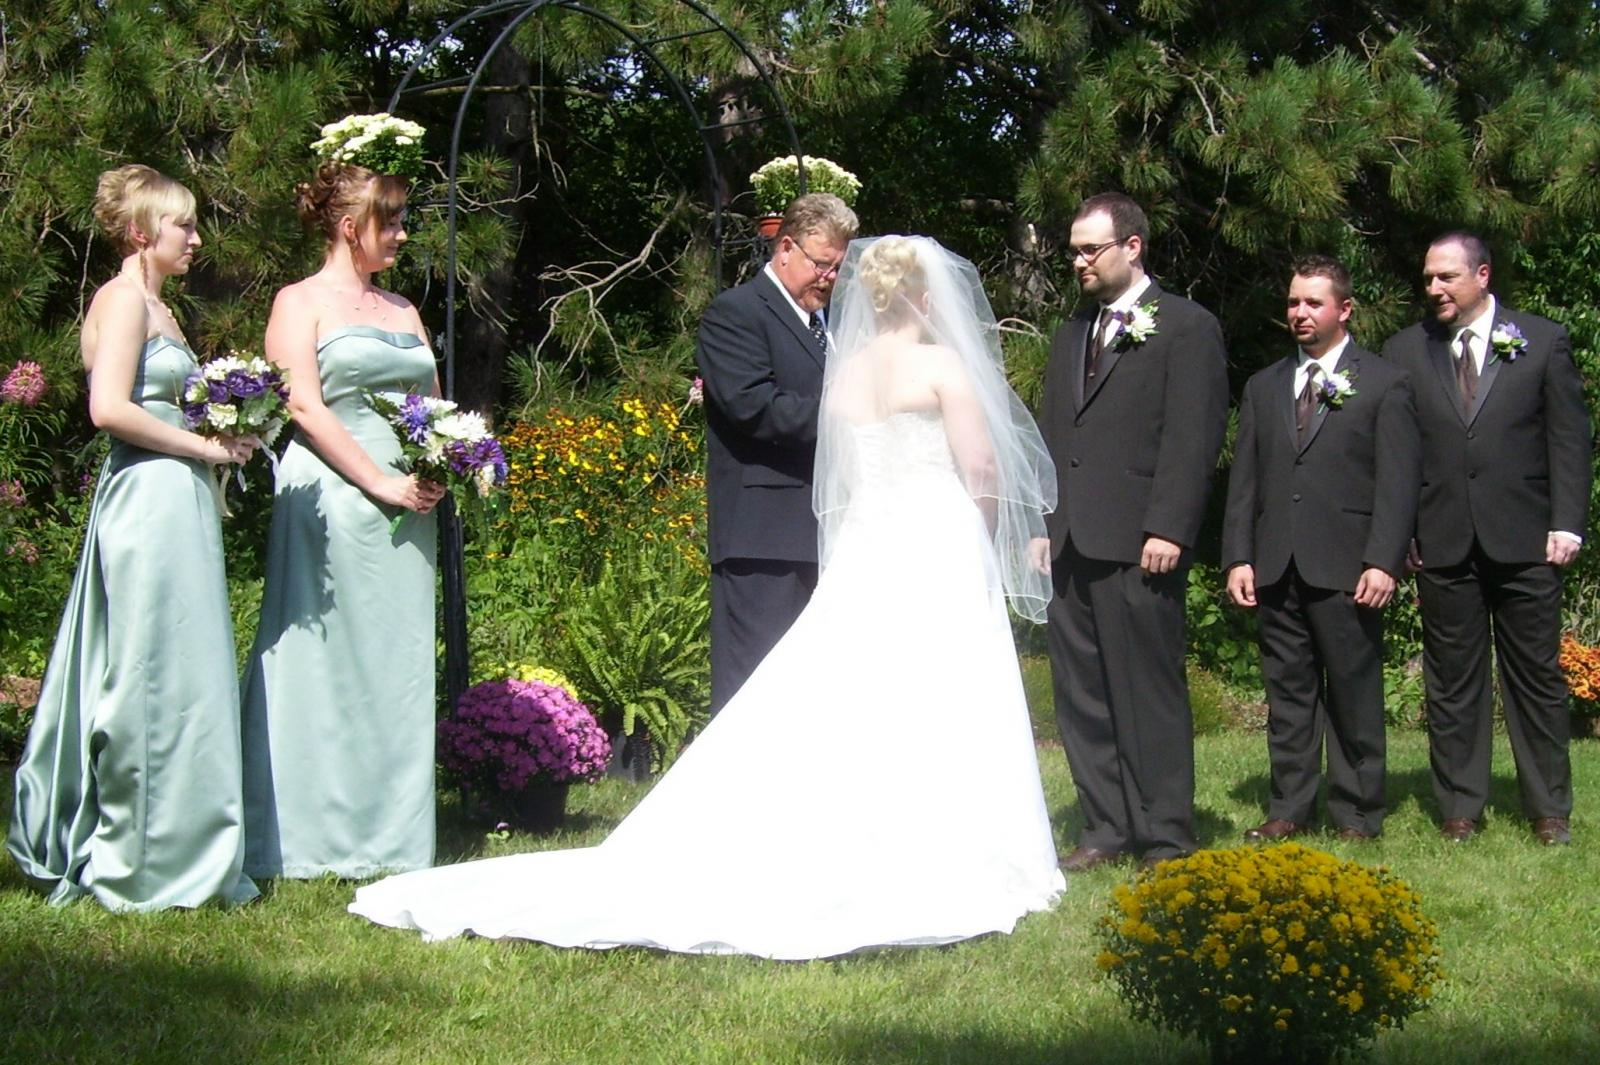 Finnr's Daughter's wedding